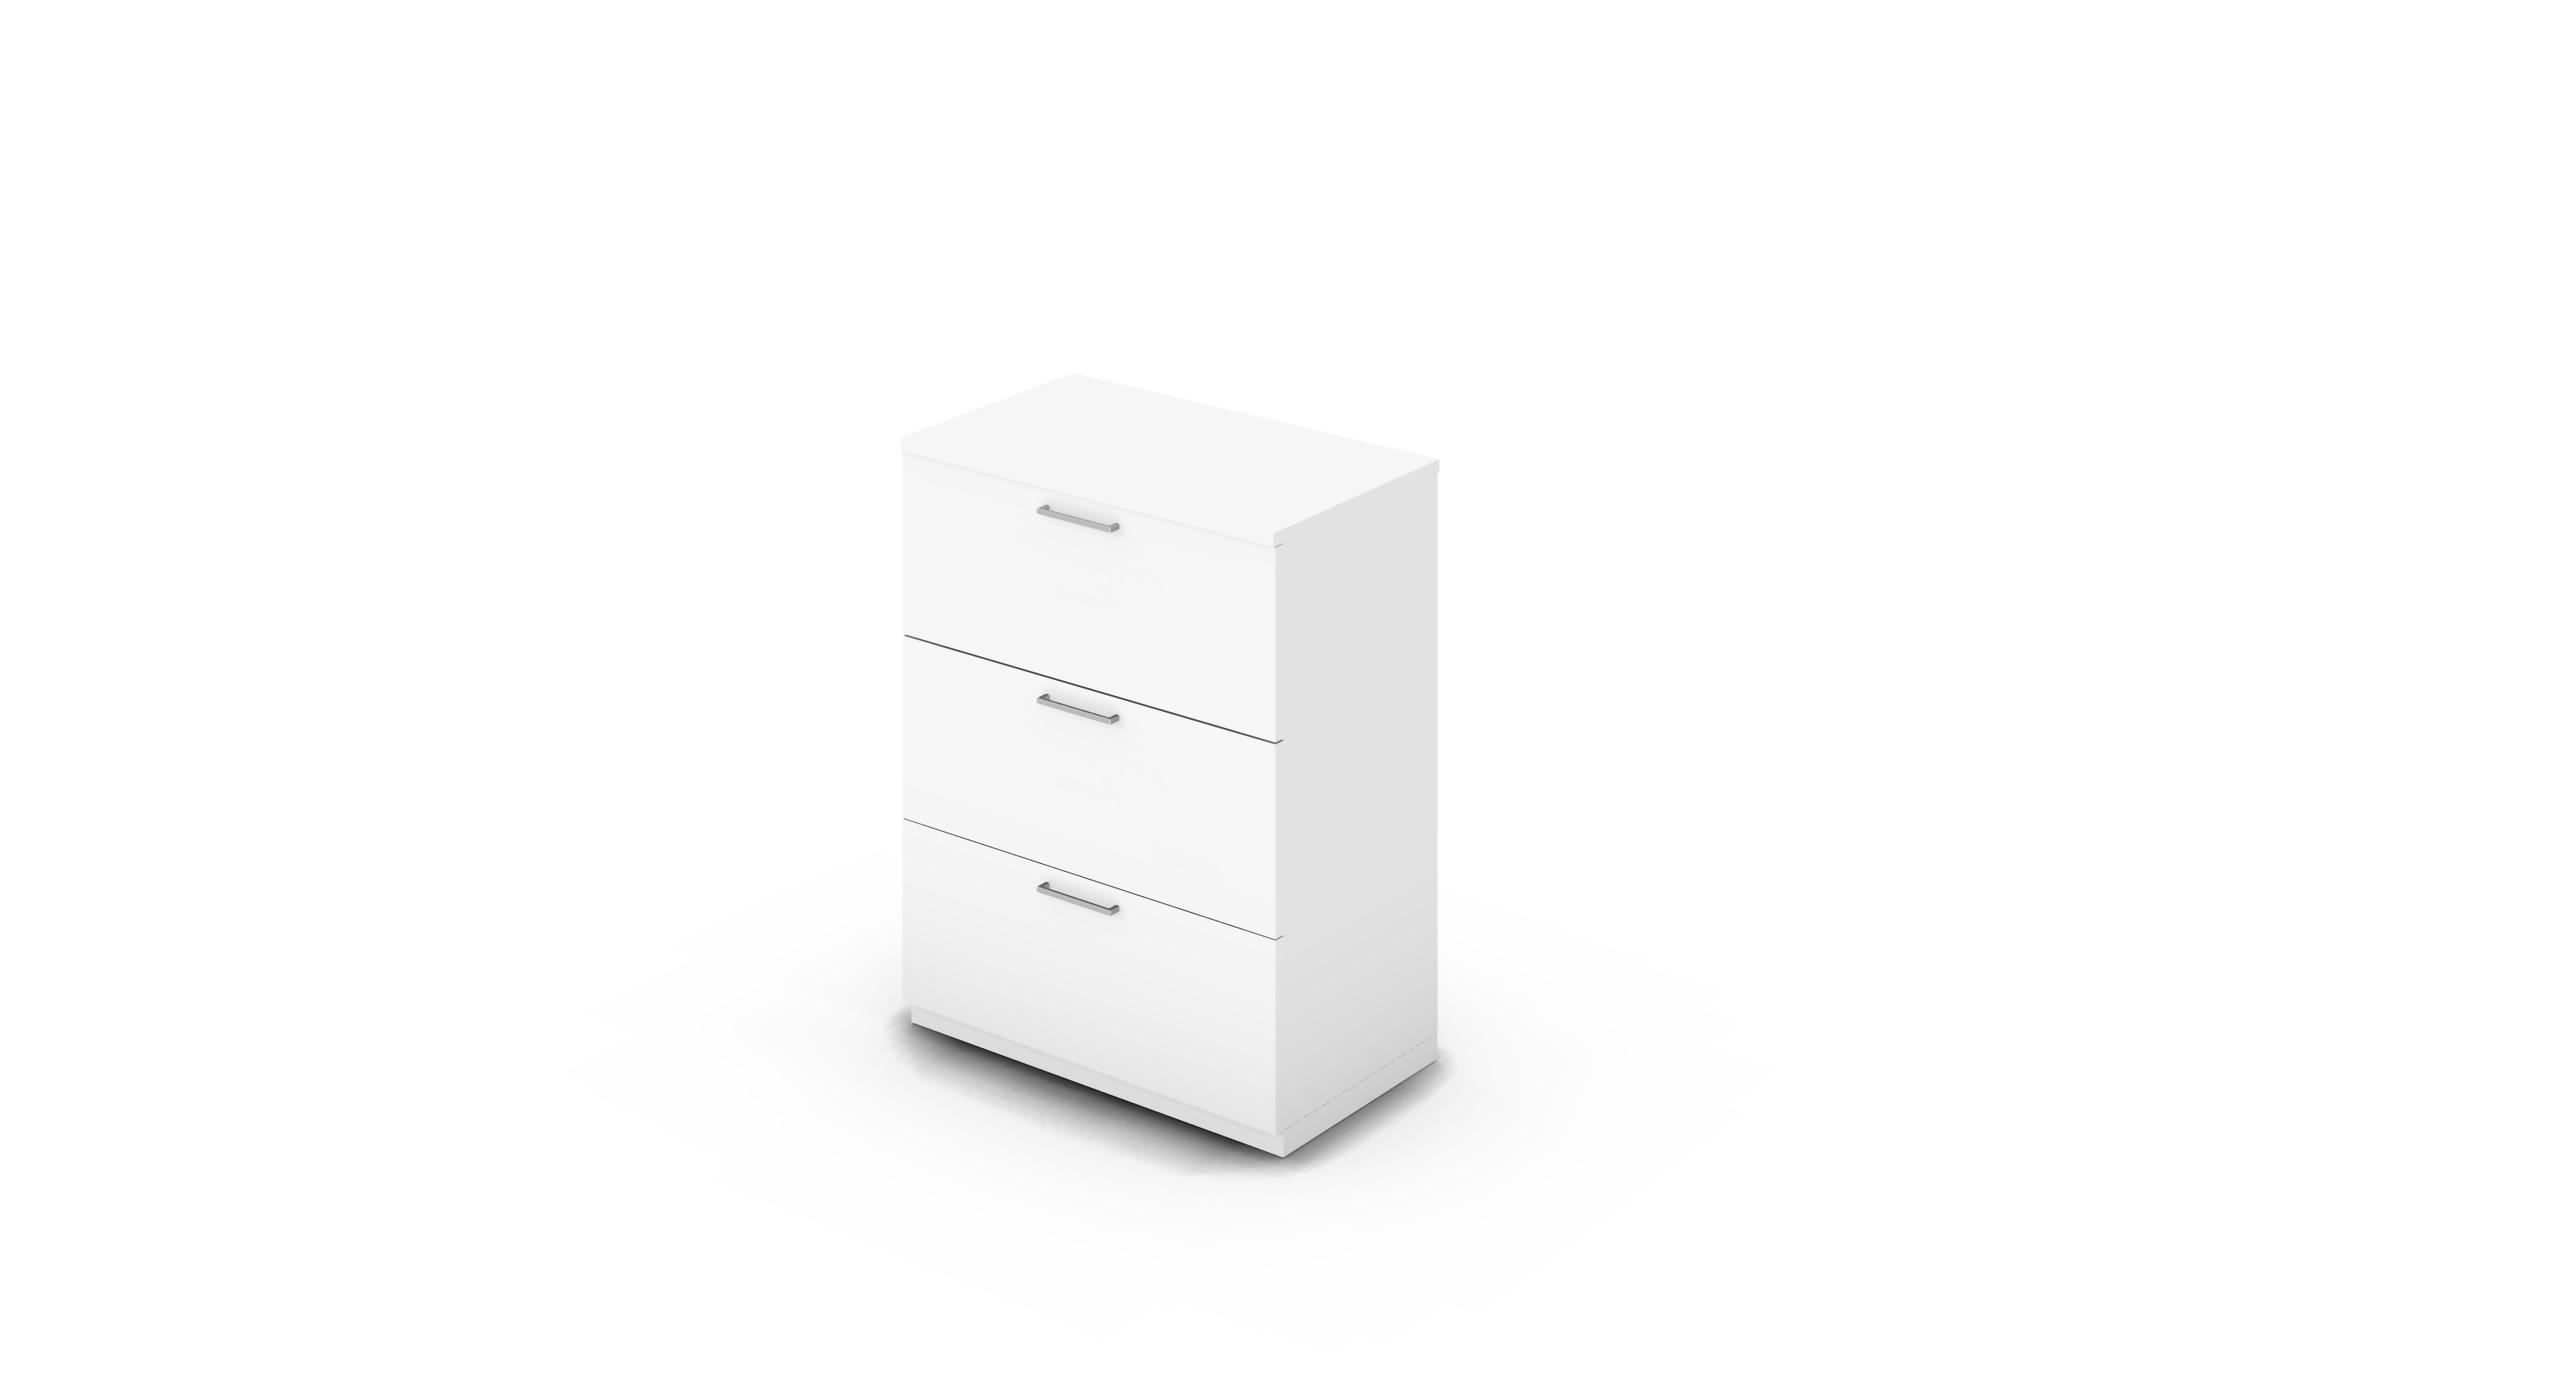 Cabinet_800x450x1125_DR_White_Bar_Square_NoCylinder